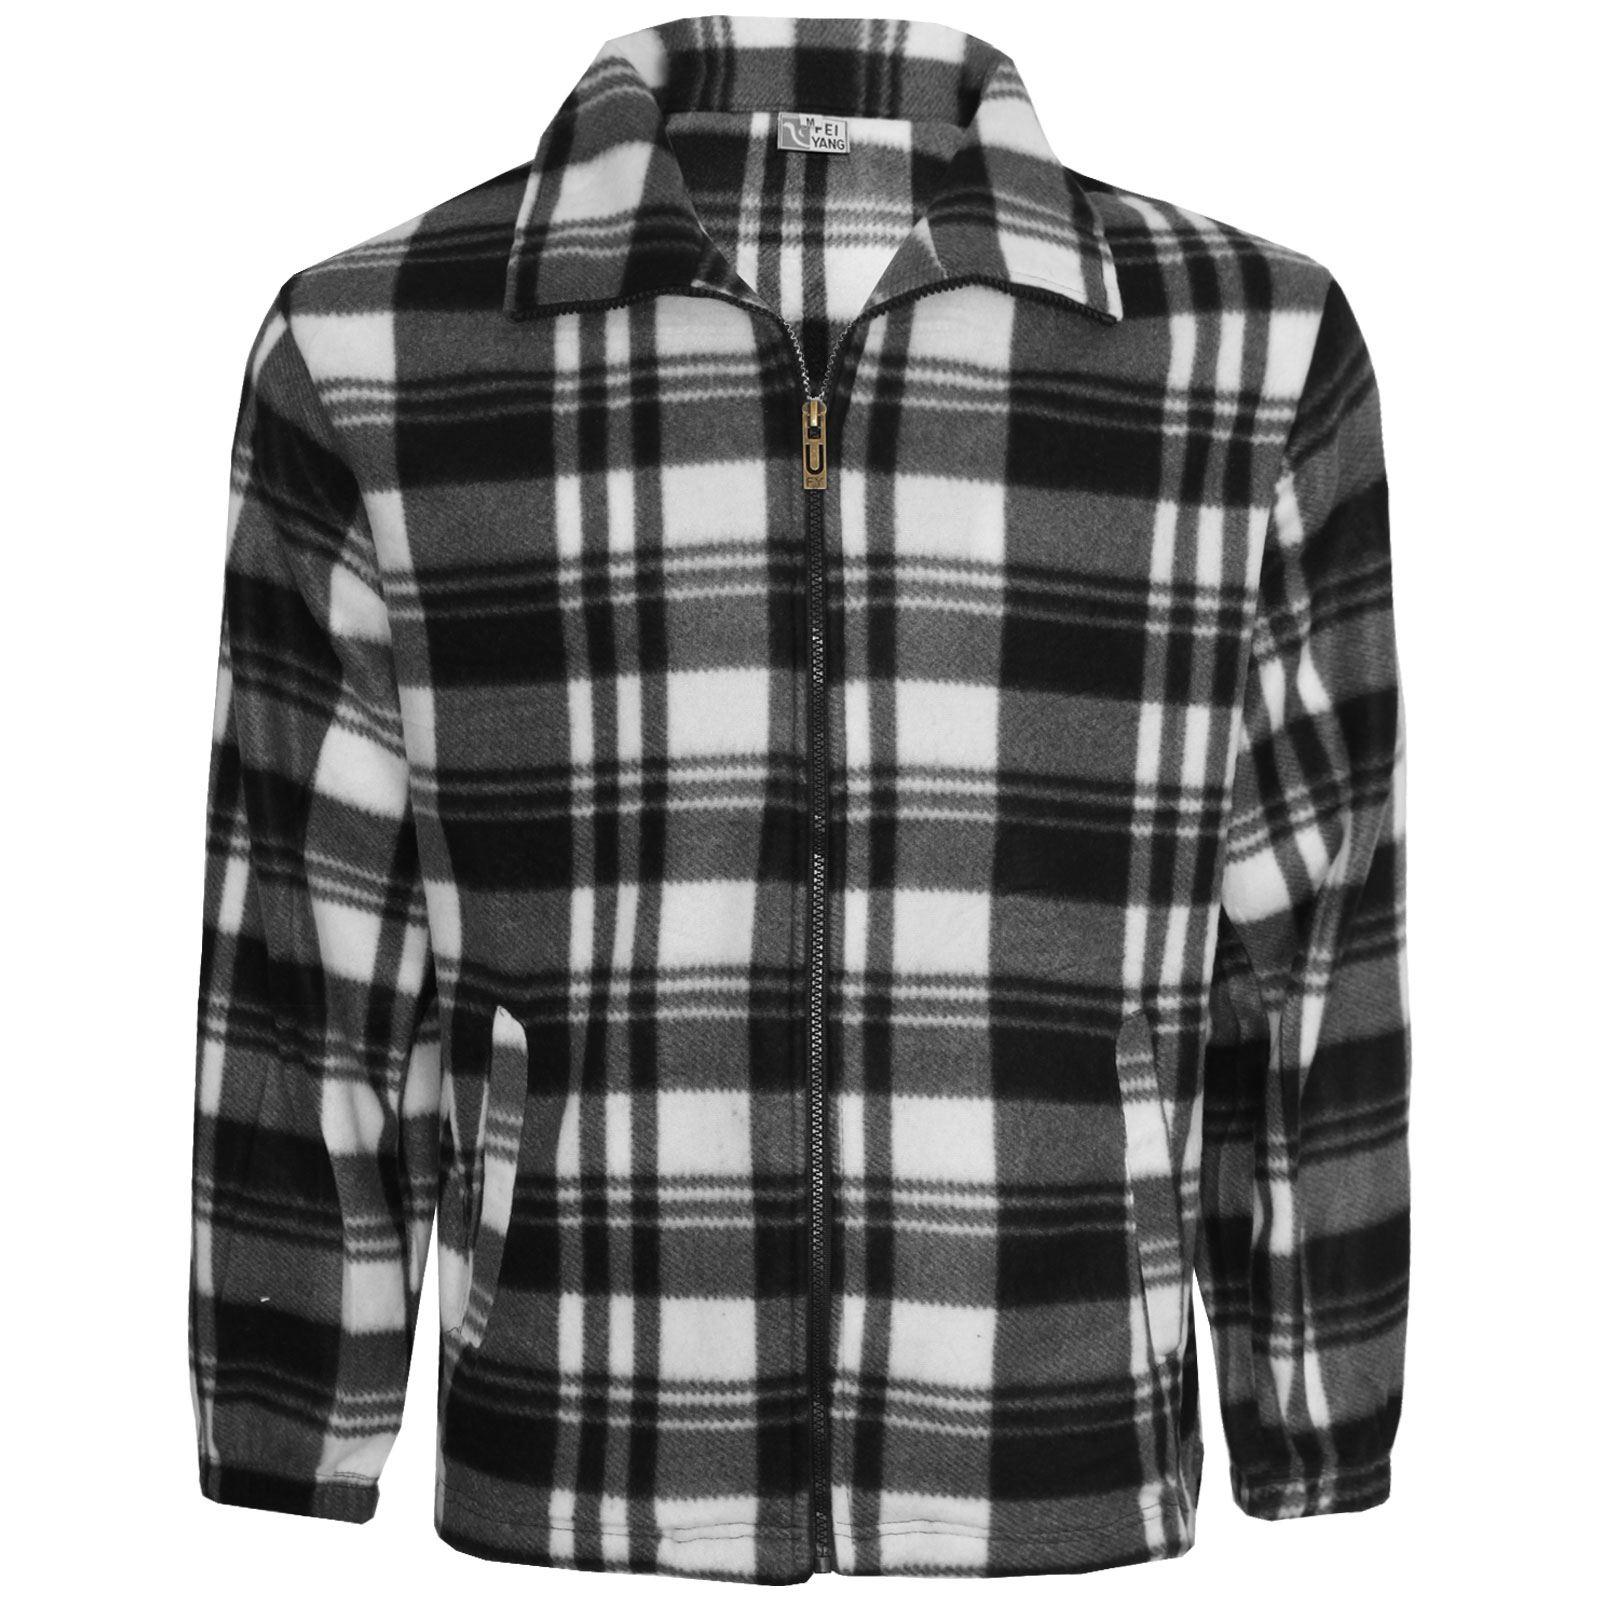 Mens zip up fleece shirt check lumberjack light flannel for Mens warm flannel shirts